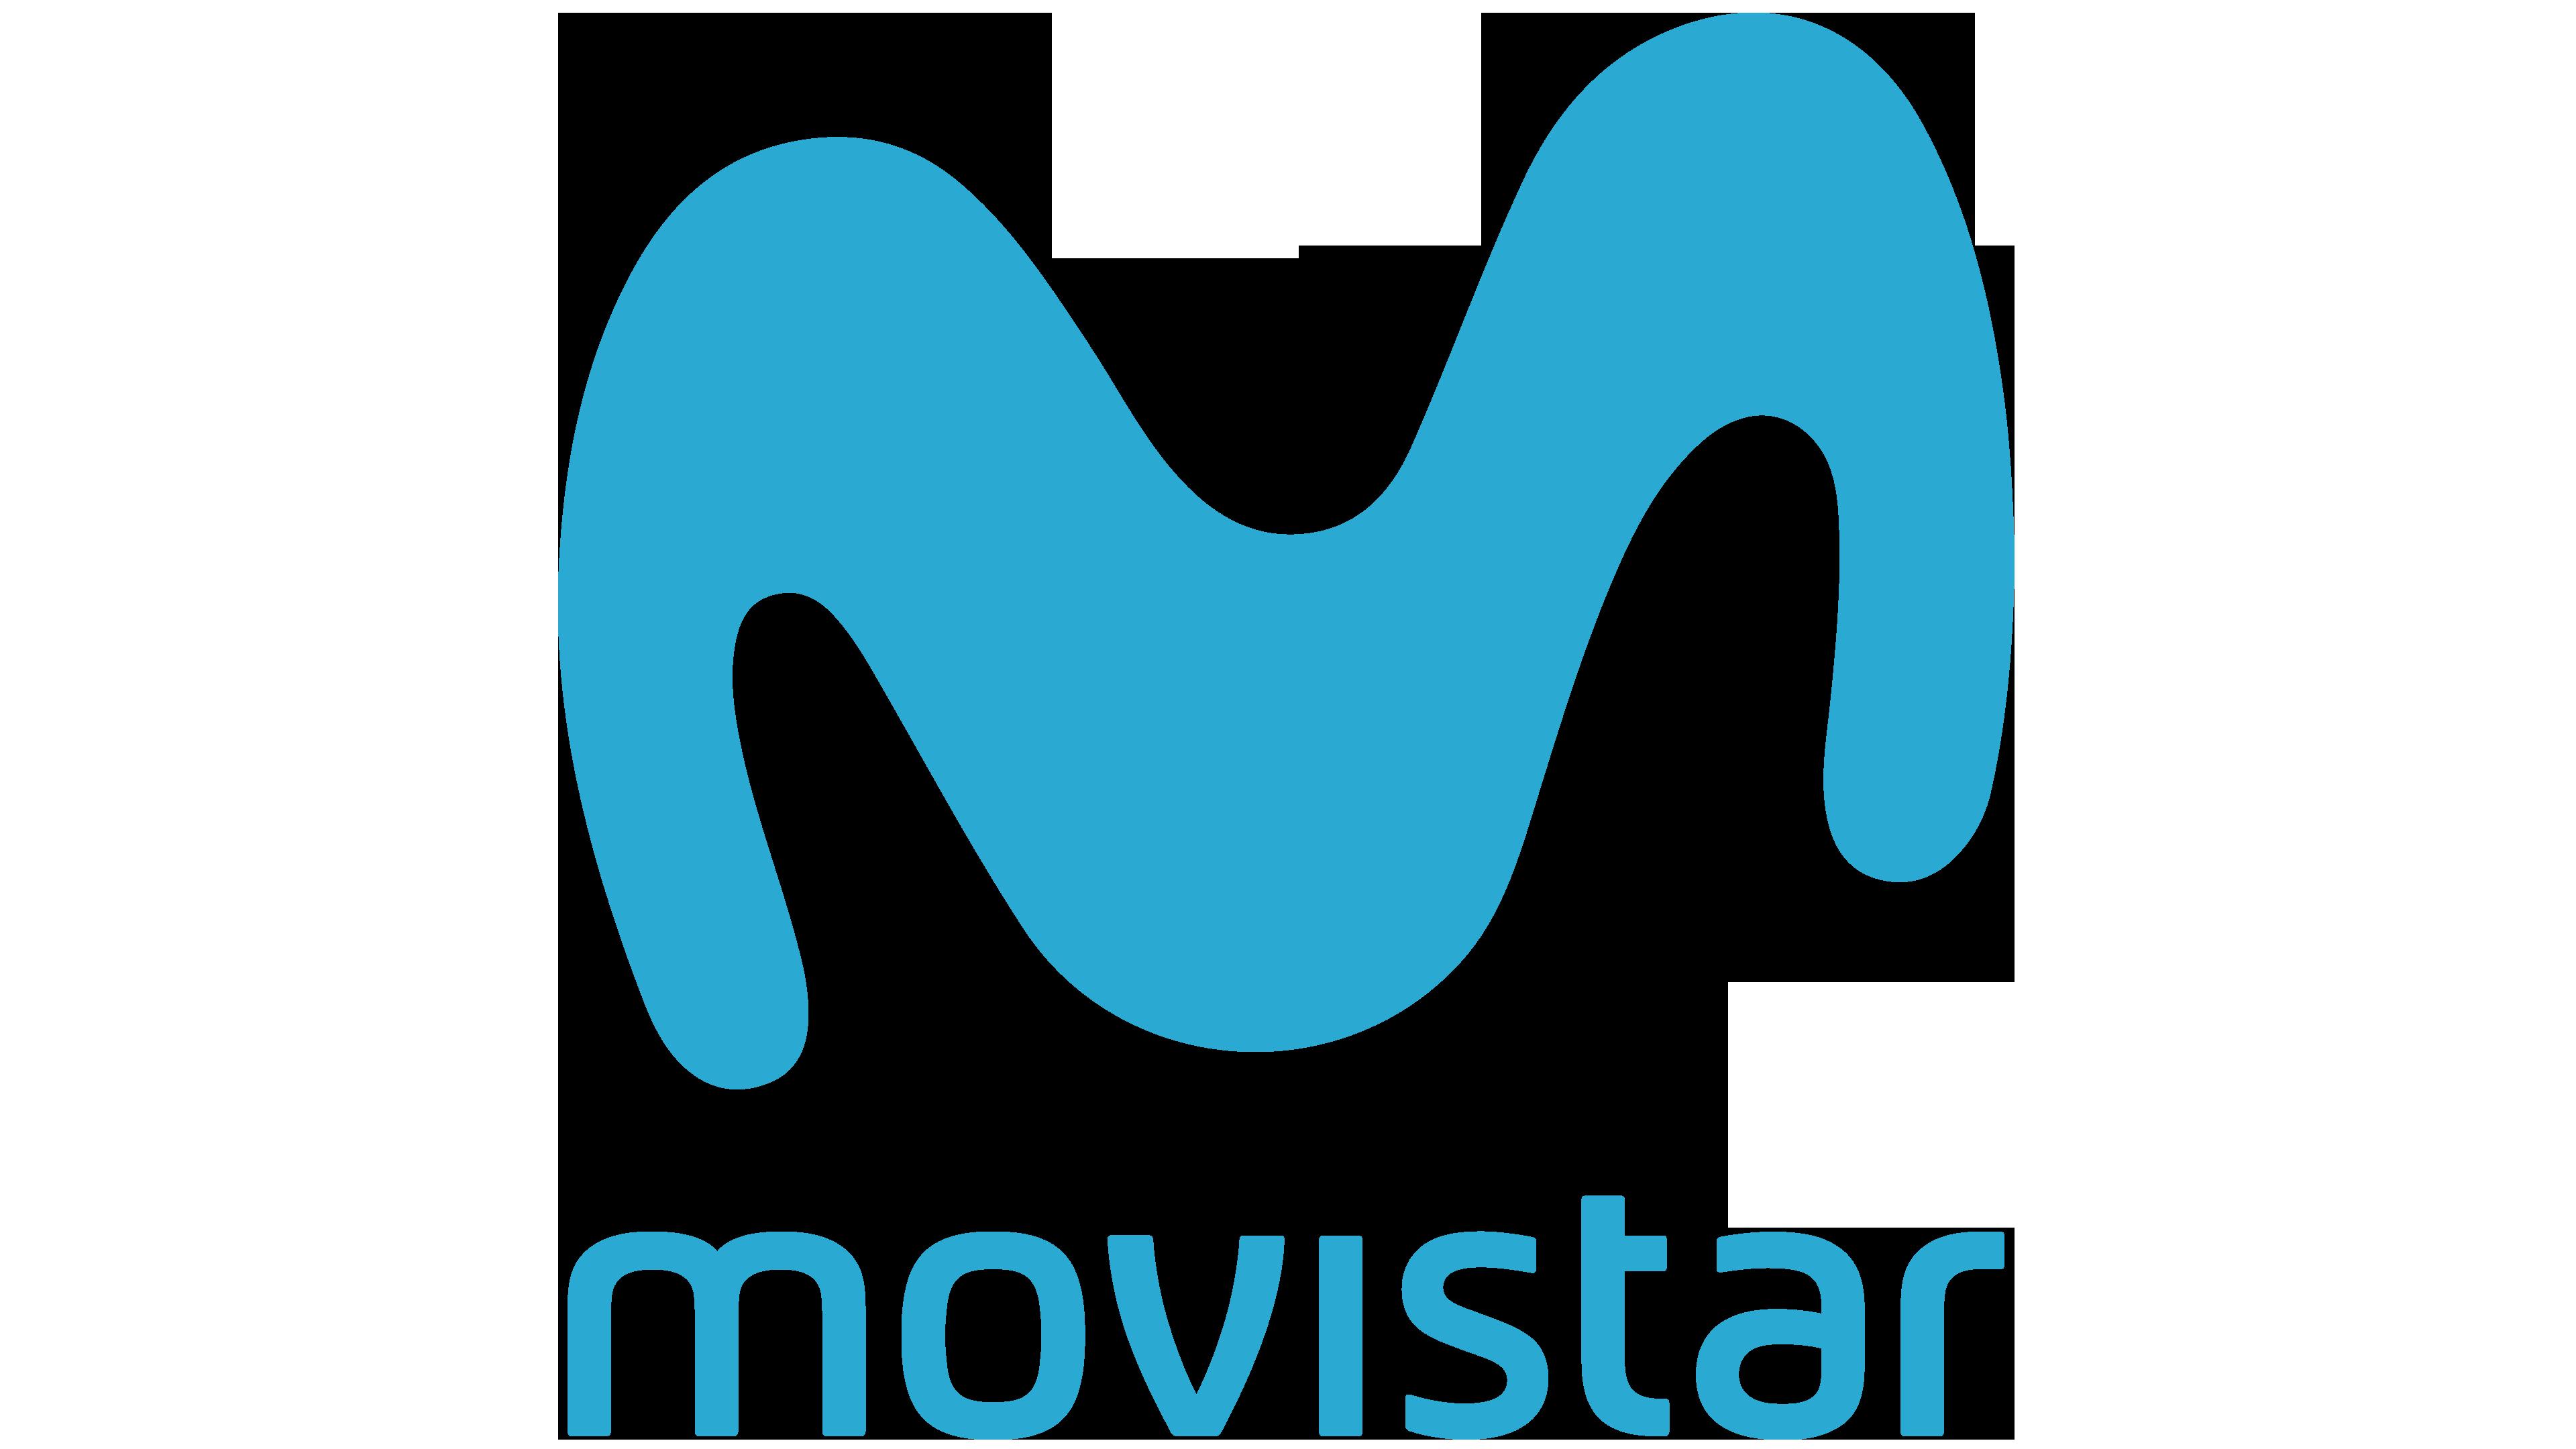 Cobertura Movistar: Descubre si tienes cobertura 4G y 3G